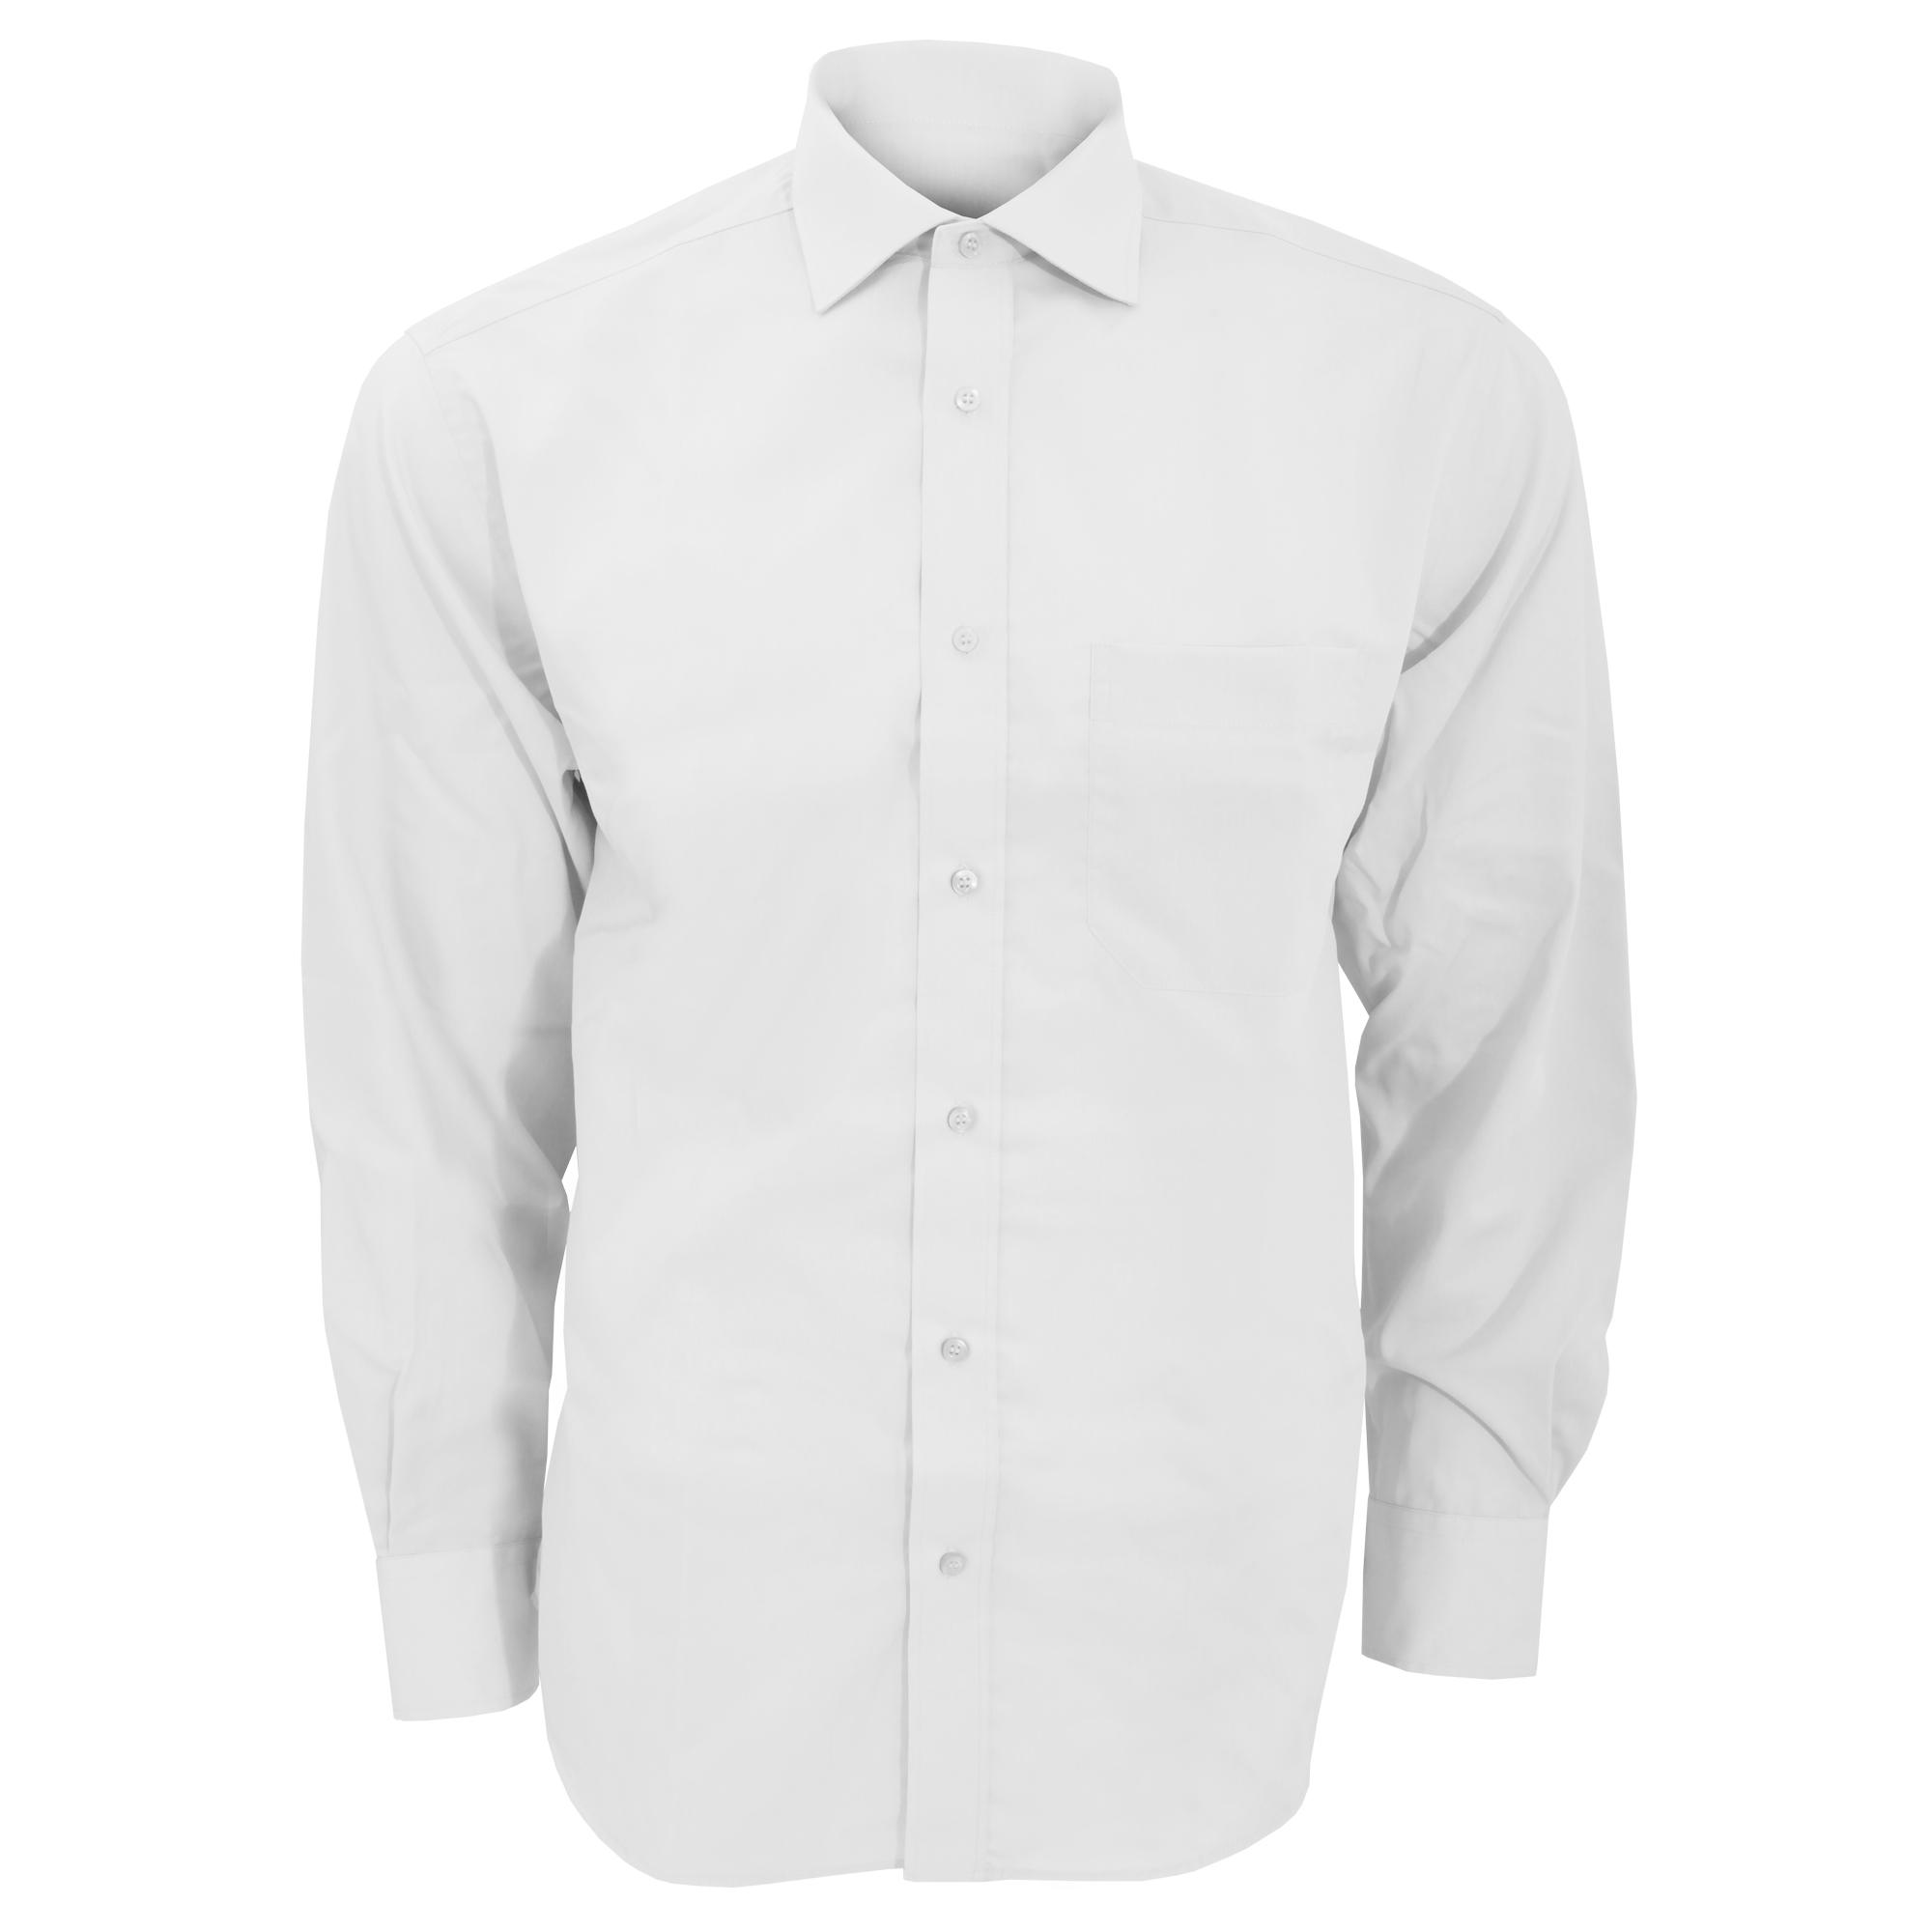 Kustom Kit Mens Premium Non Iron Long Sleeve Shirt (18.5inch) (White)